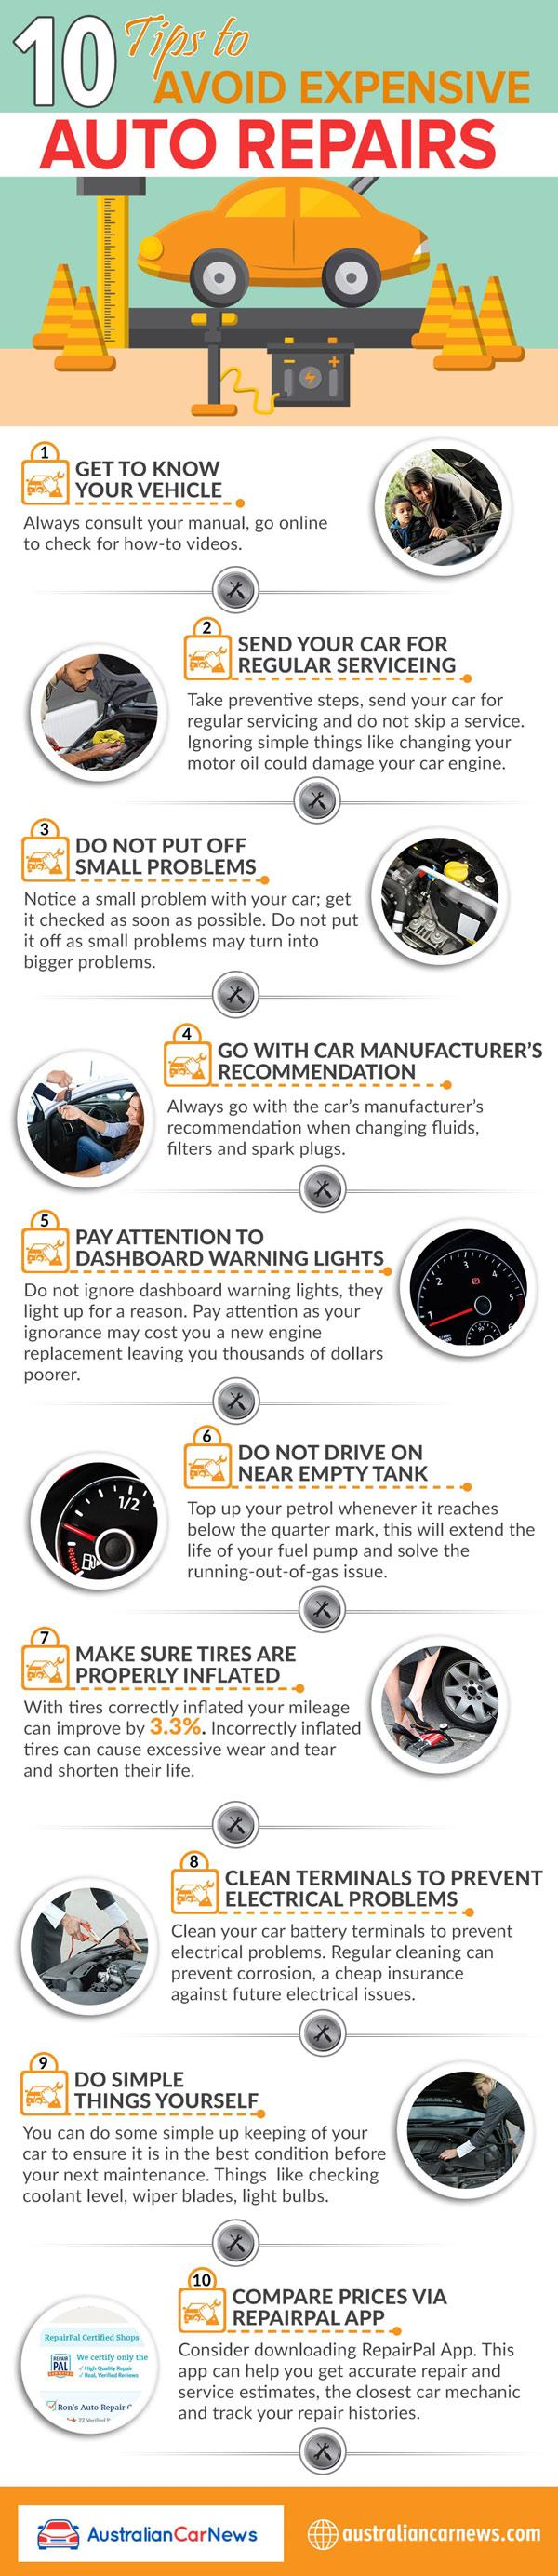 expensive-auto-repairs